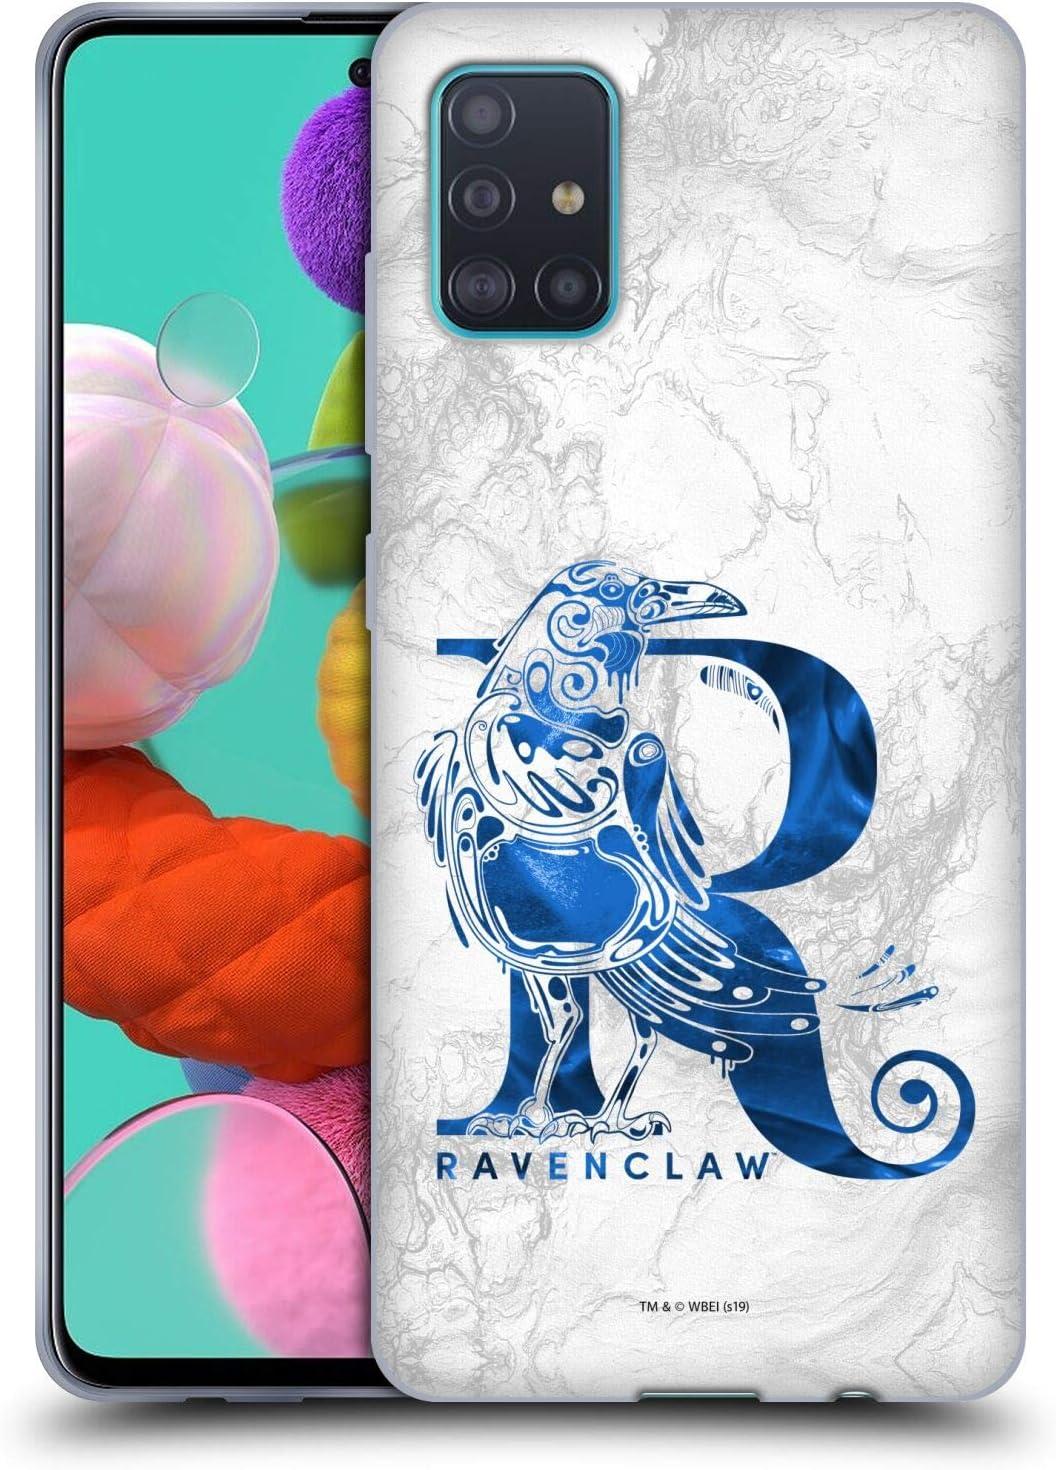 Head Case Designs Offiziell Zugelassen Harry Potter Ravenclaw Aguamenti Deathly Hallows Ix Soft Gel Handyhülle Hülle Huelle Kompatibel Mit Samsung Galaxy A51